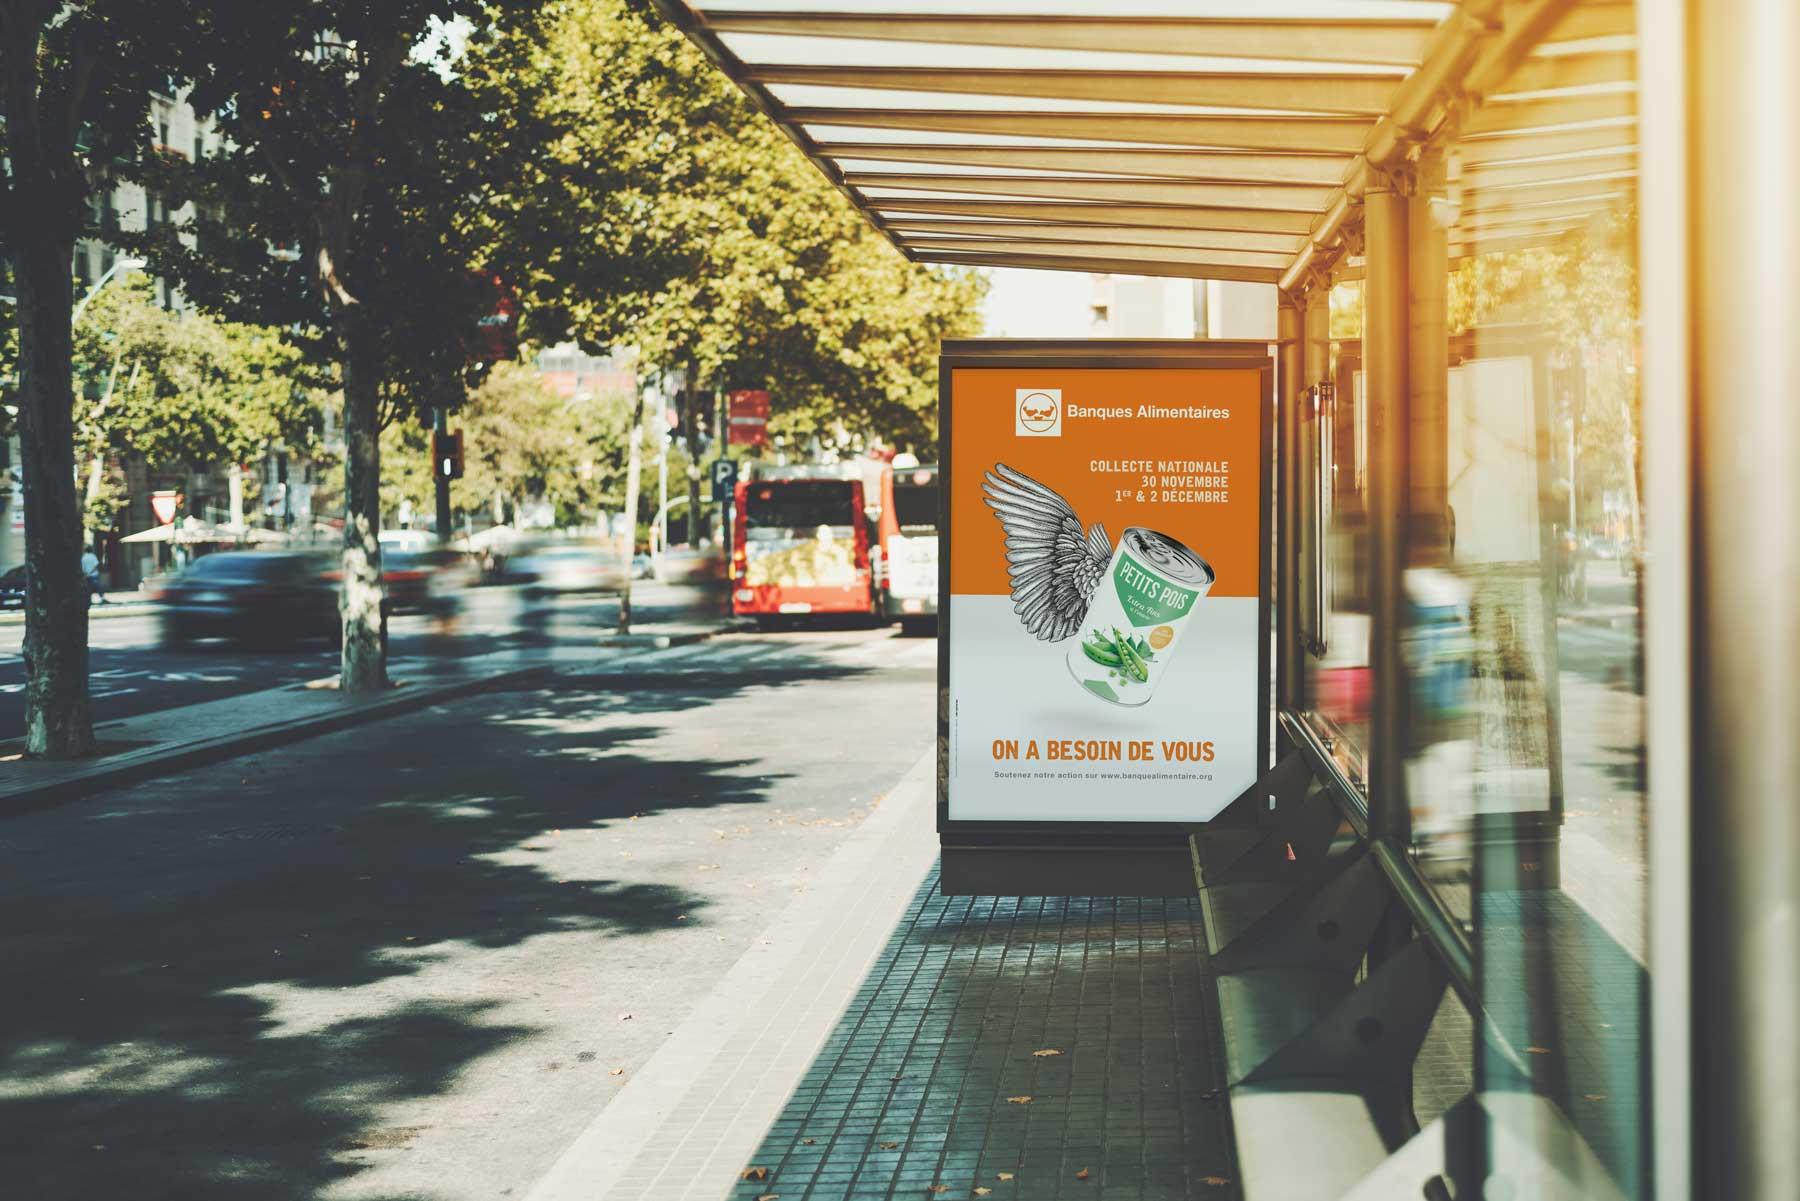 bus-banques-alimentaires-collecte